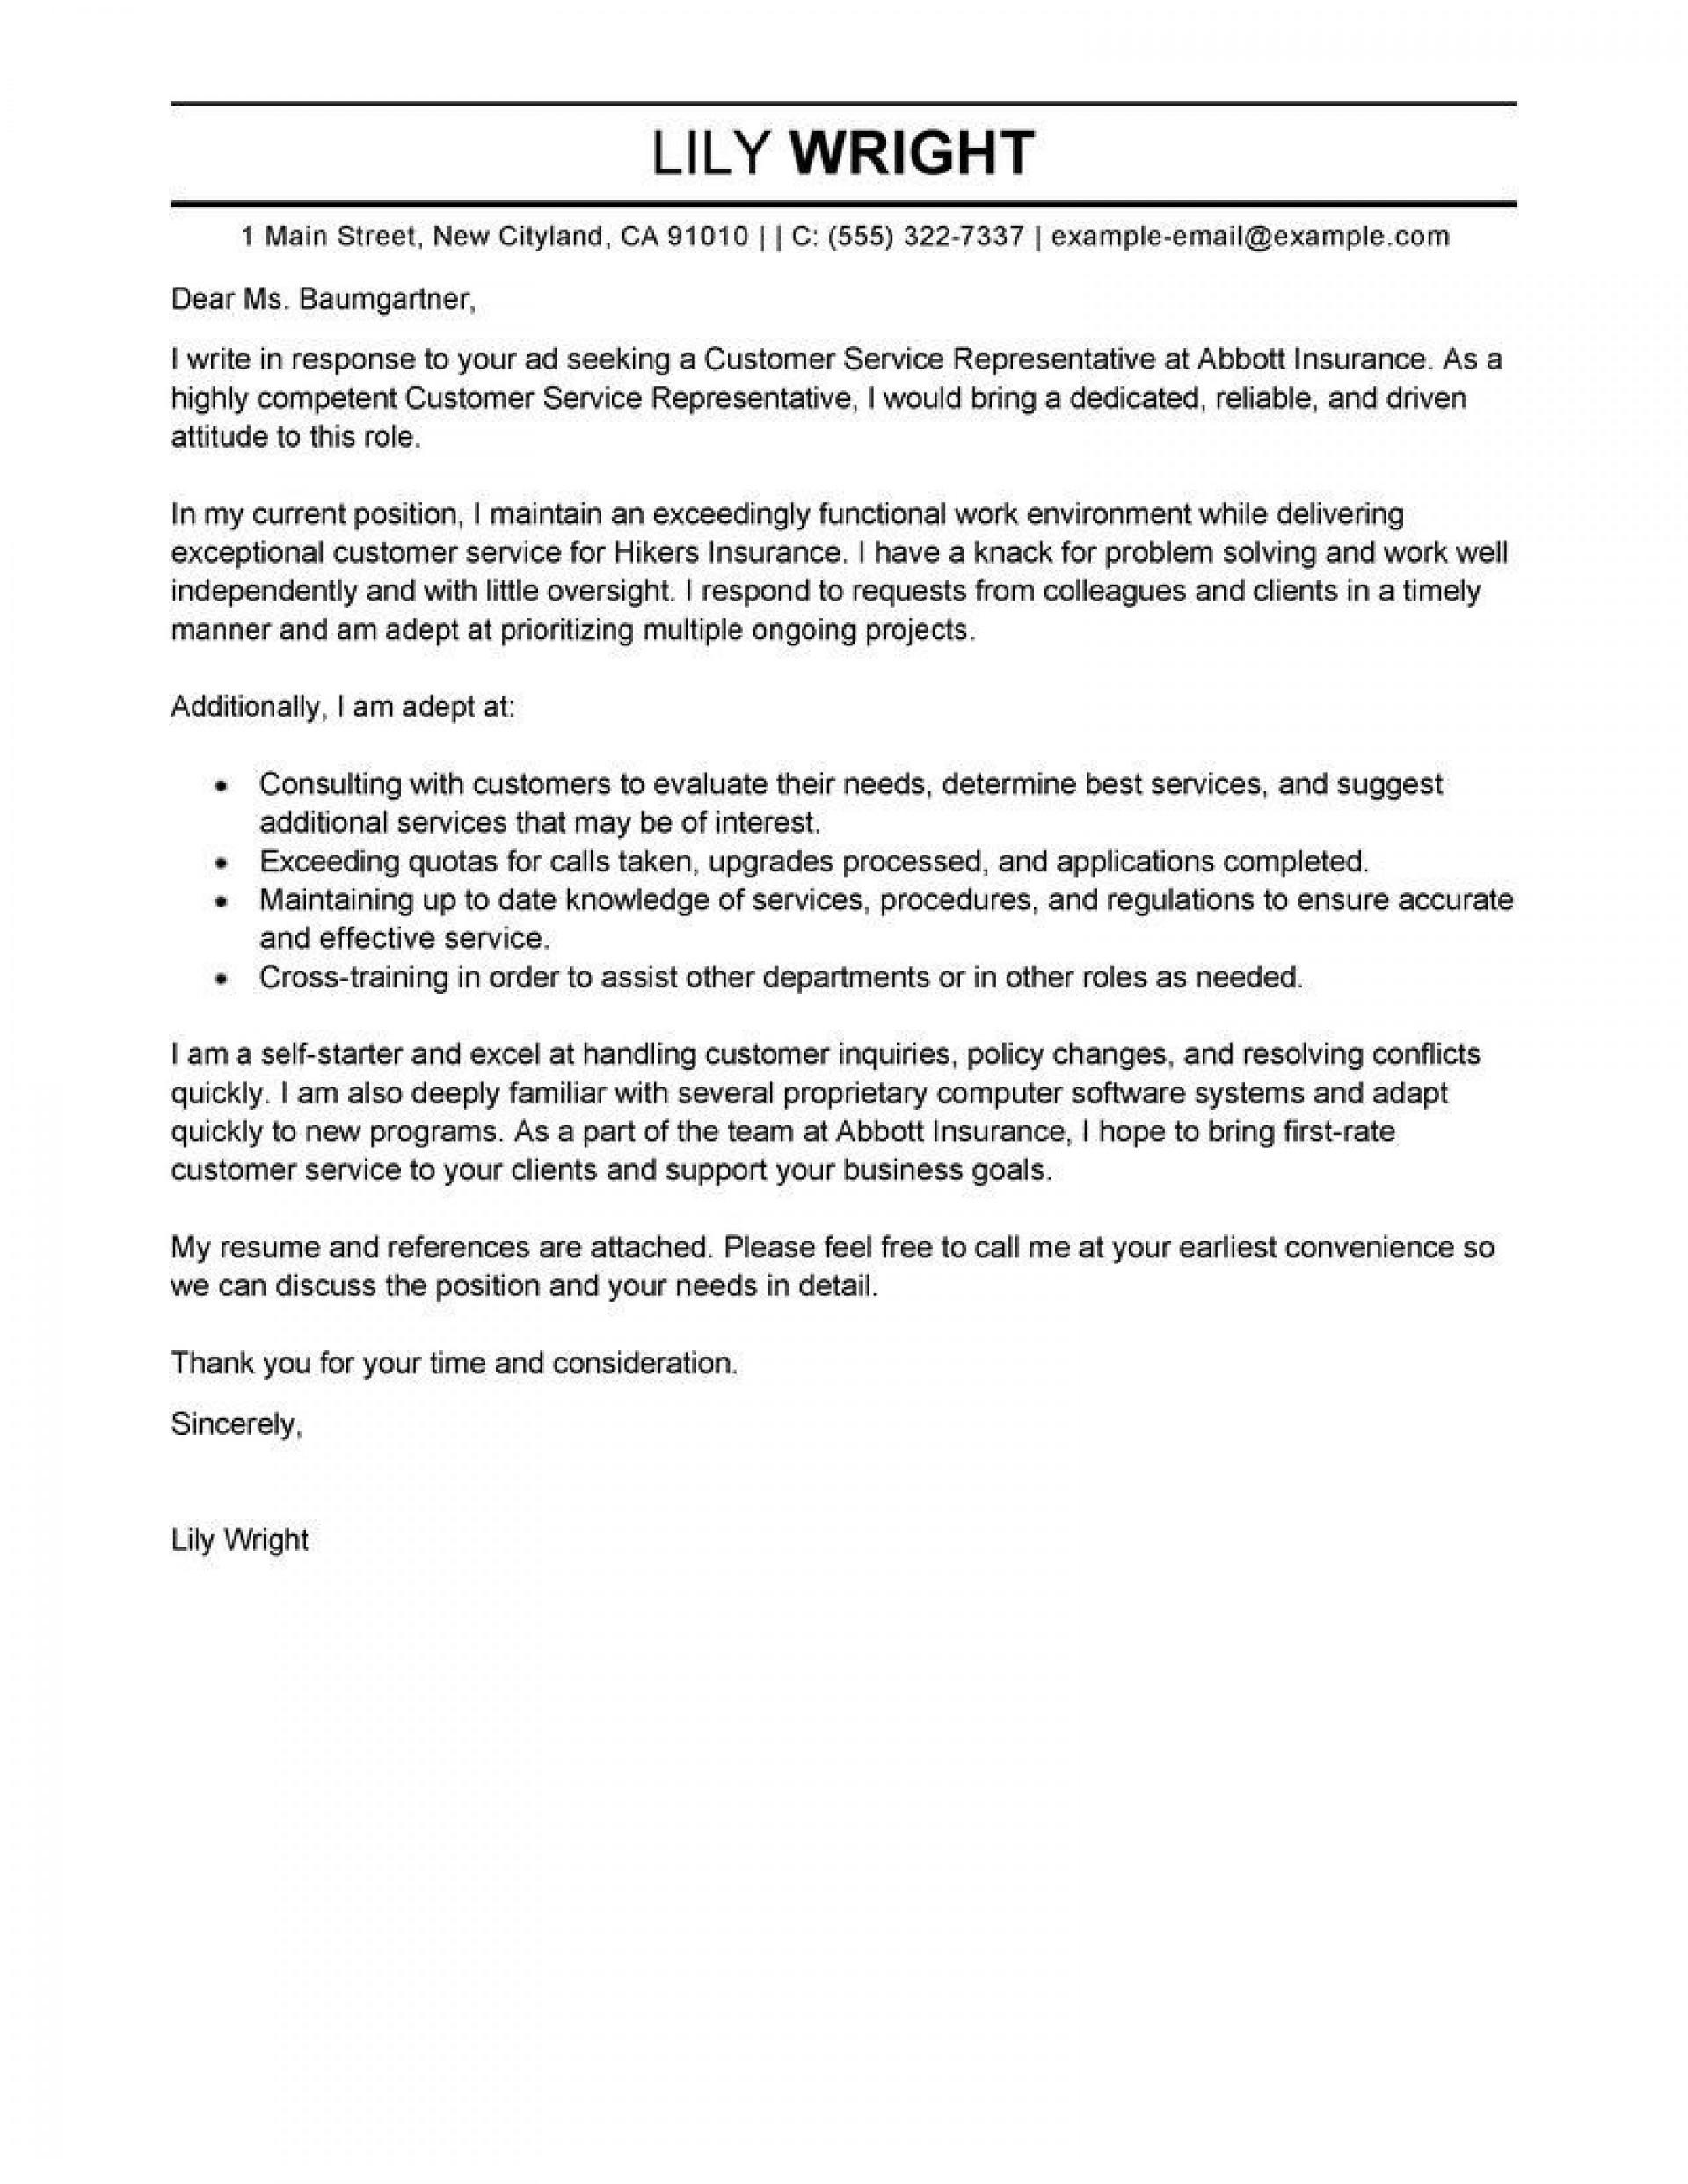 000 Sensational Email Cover Letter Example For Customer Service Idea  Sample Representative1920